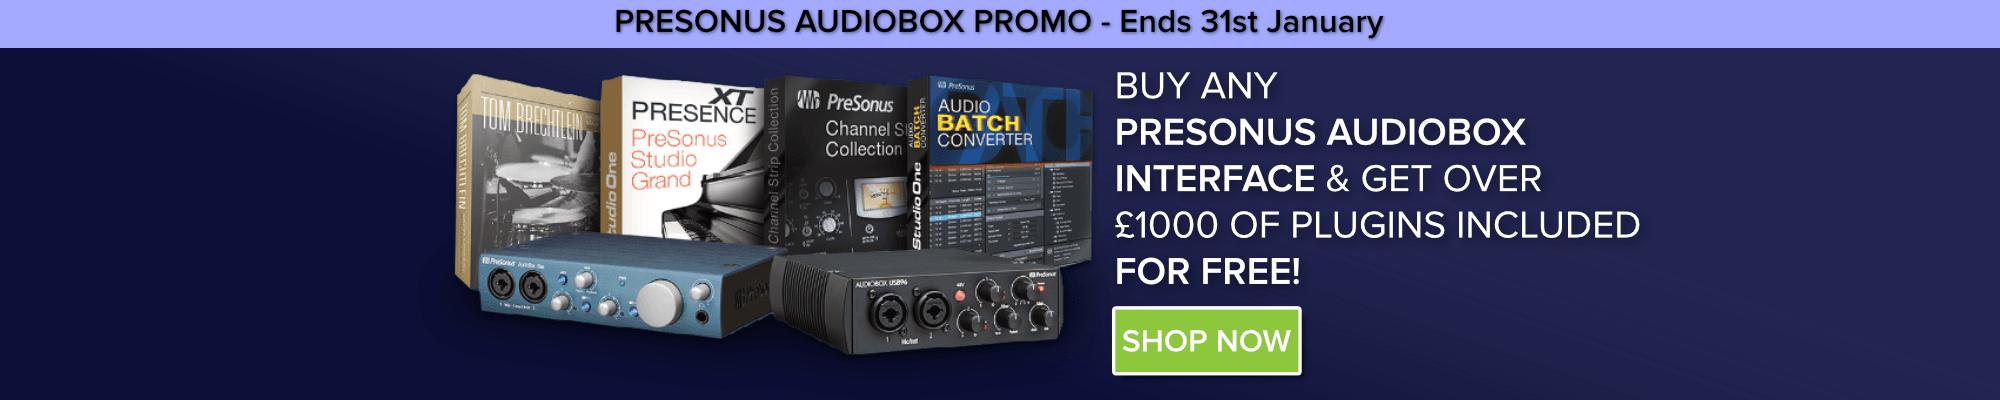 PreSonus Audiobox Promo